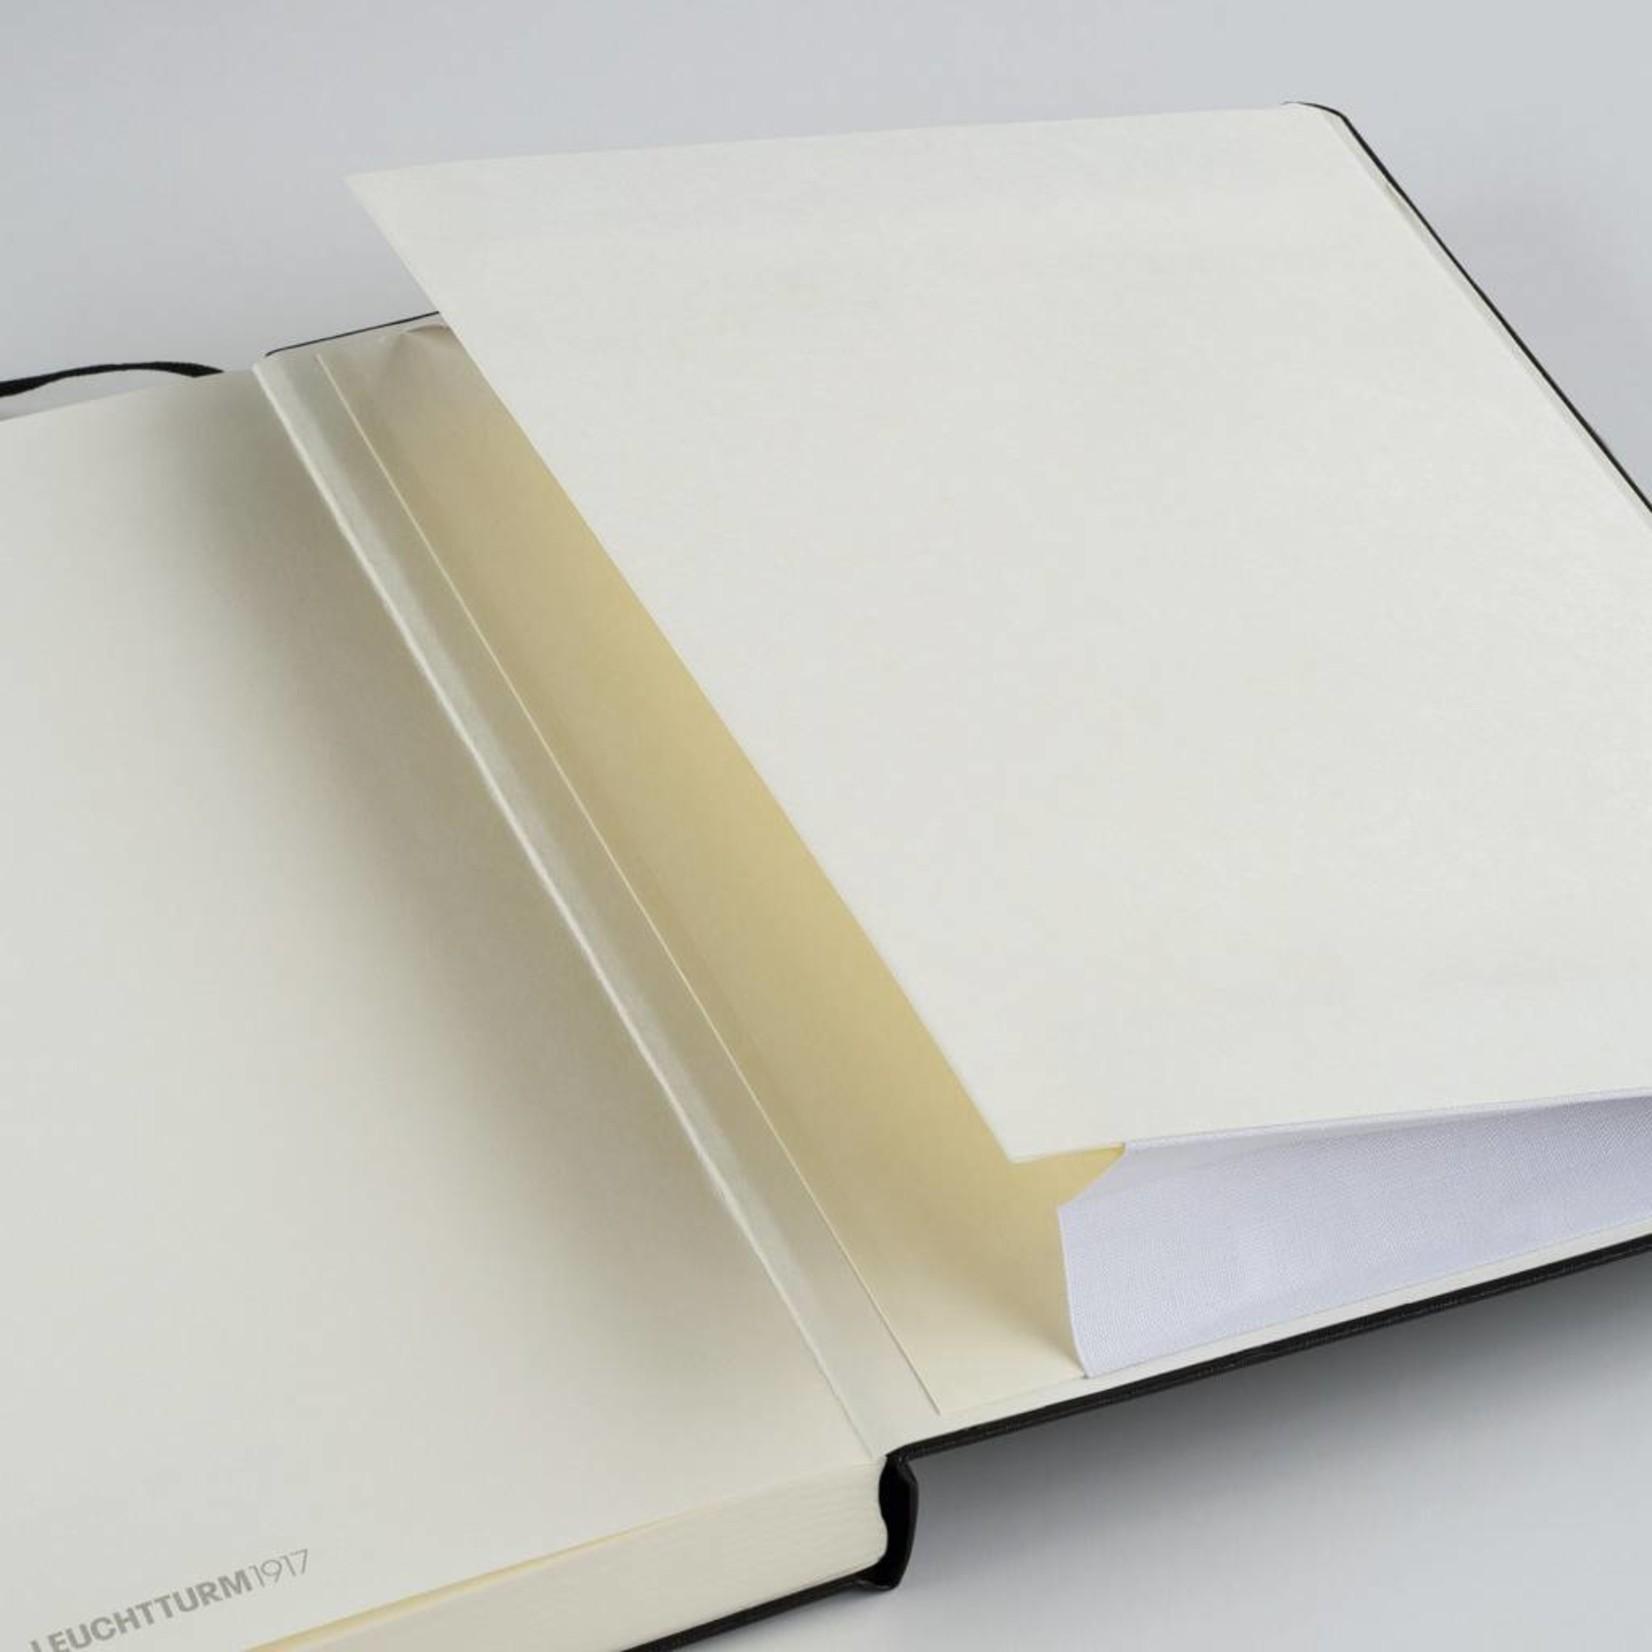 Leuchtturm1917 LT Notizbuch A4 MASTER SLIM New Pink glatt